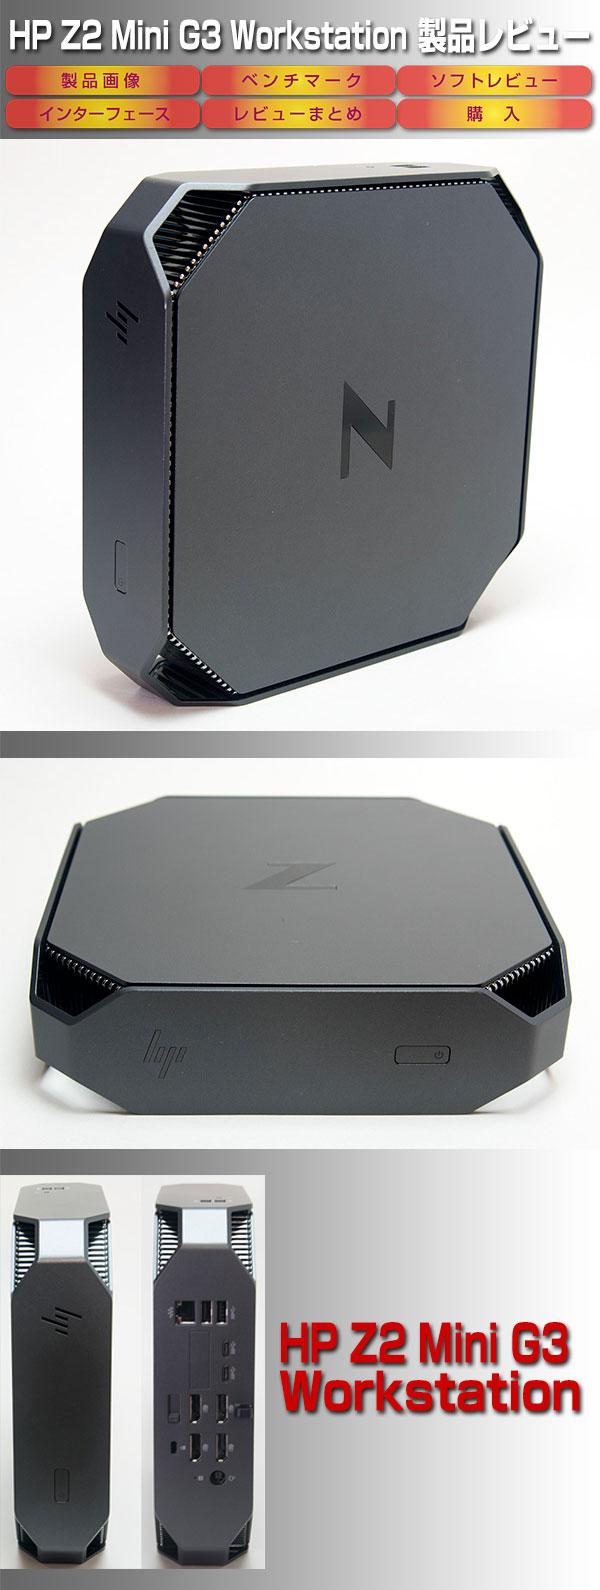 HP Z2 Mini G3 Workstation製品レビュー